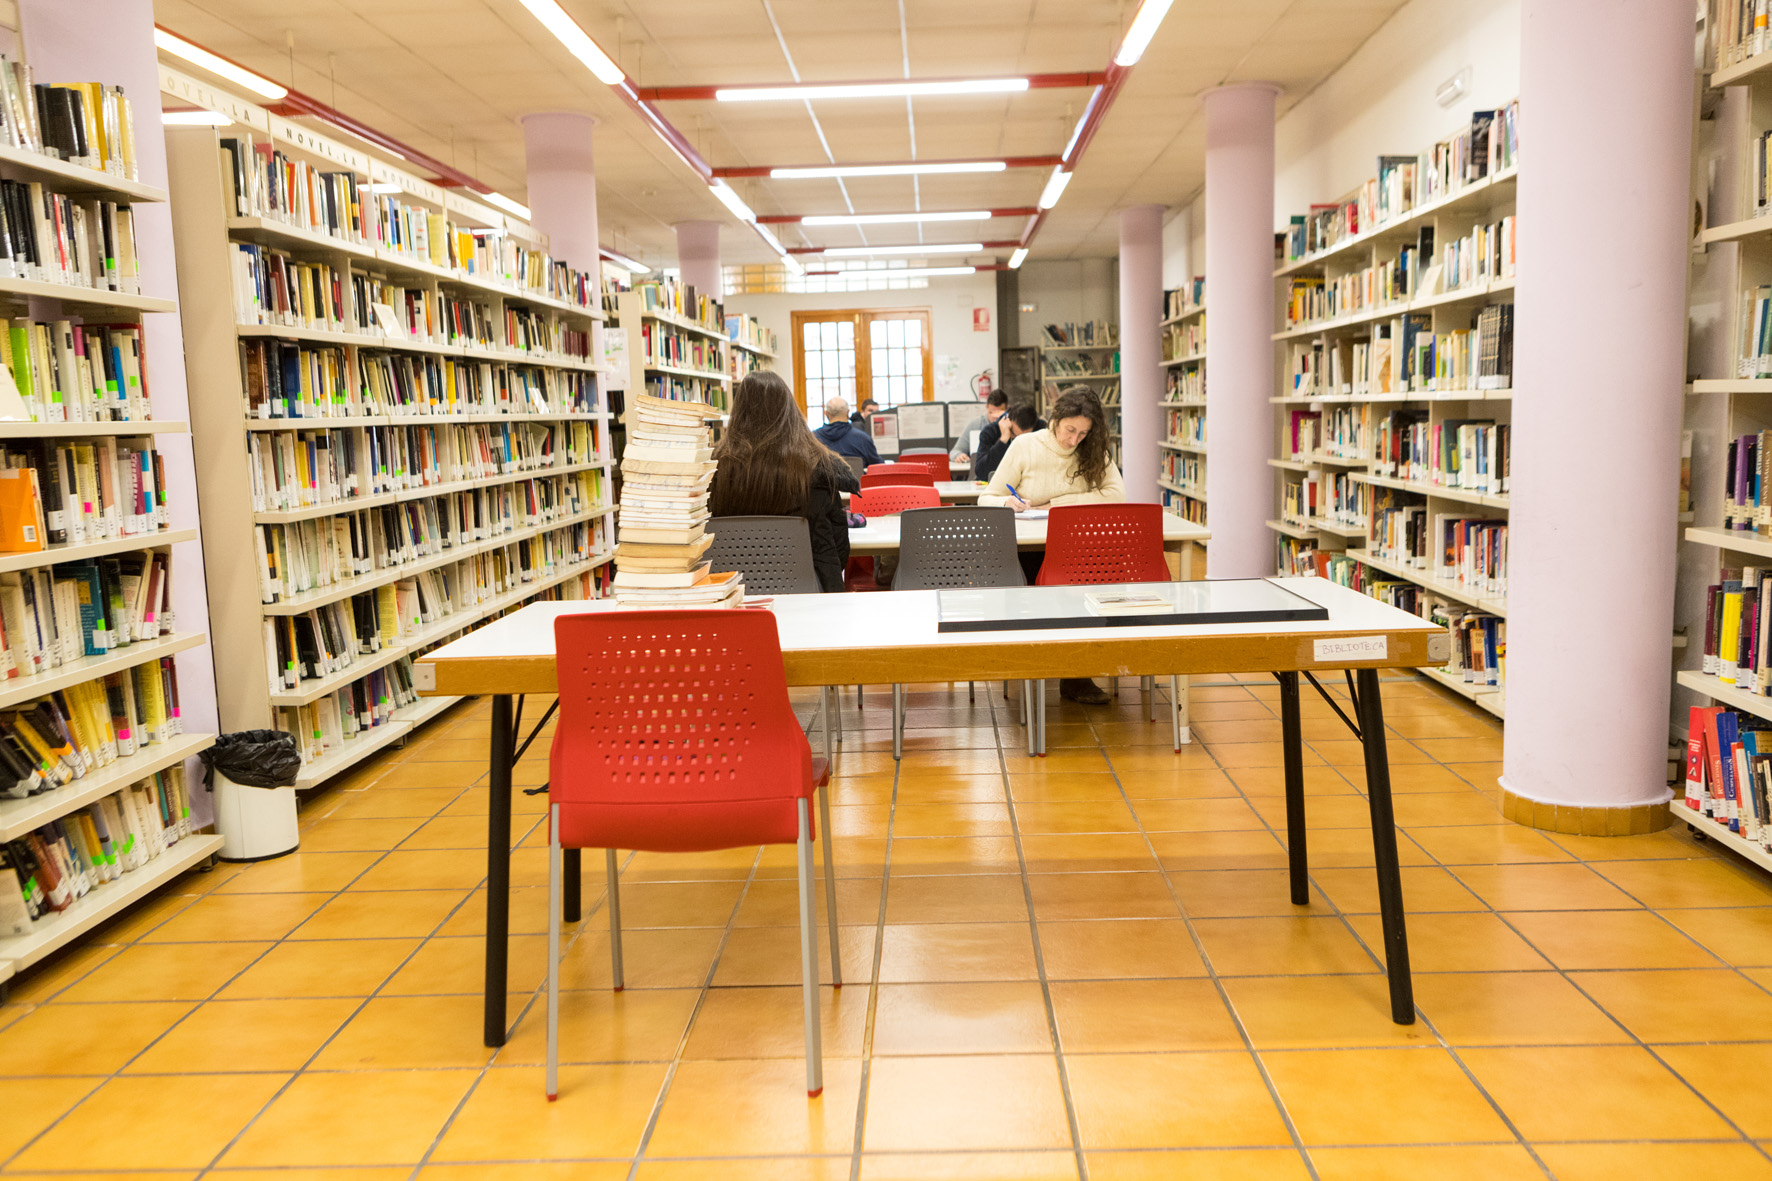 Mislata suprime la tasa para obtener el carné de la biblioteca municipal